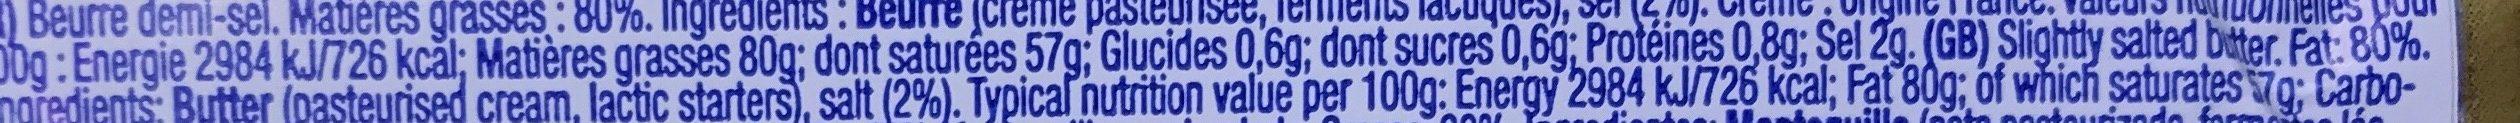 Le Beurre Demi-Sel - Voedingswaarden - fr